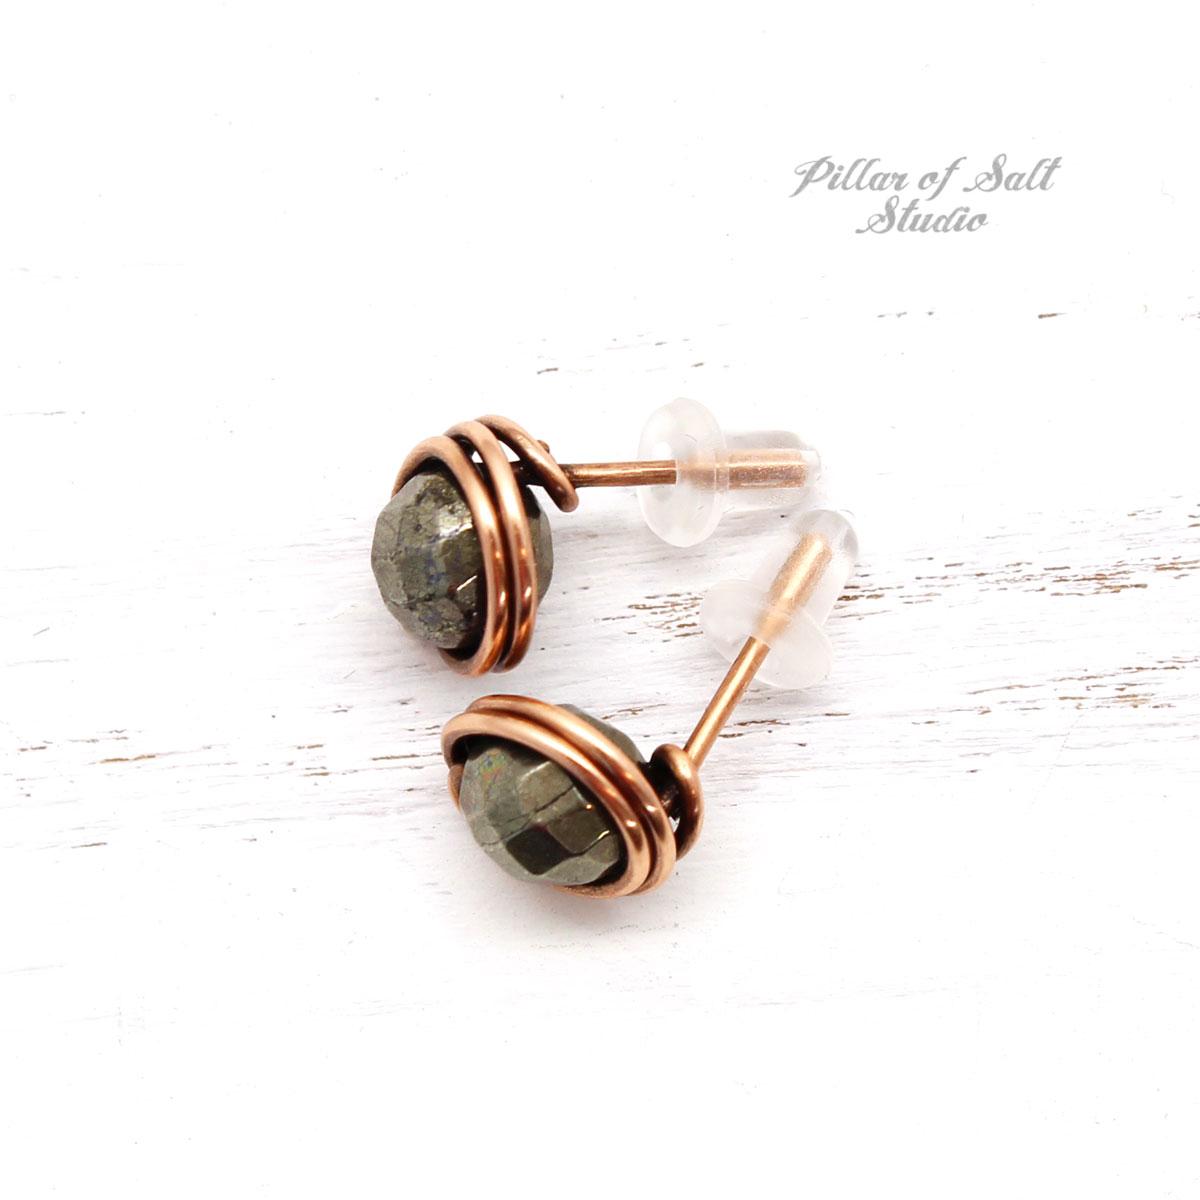 small pyrite copper stud earrings by Pillar of Salt Studio